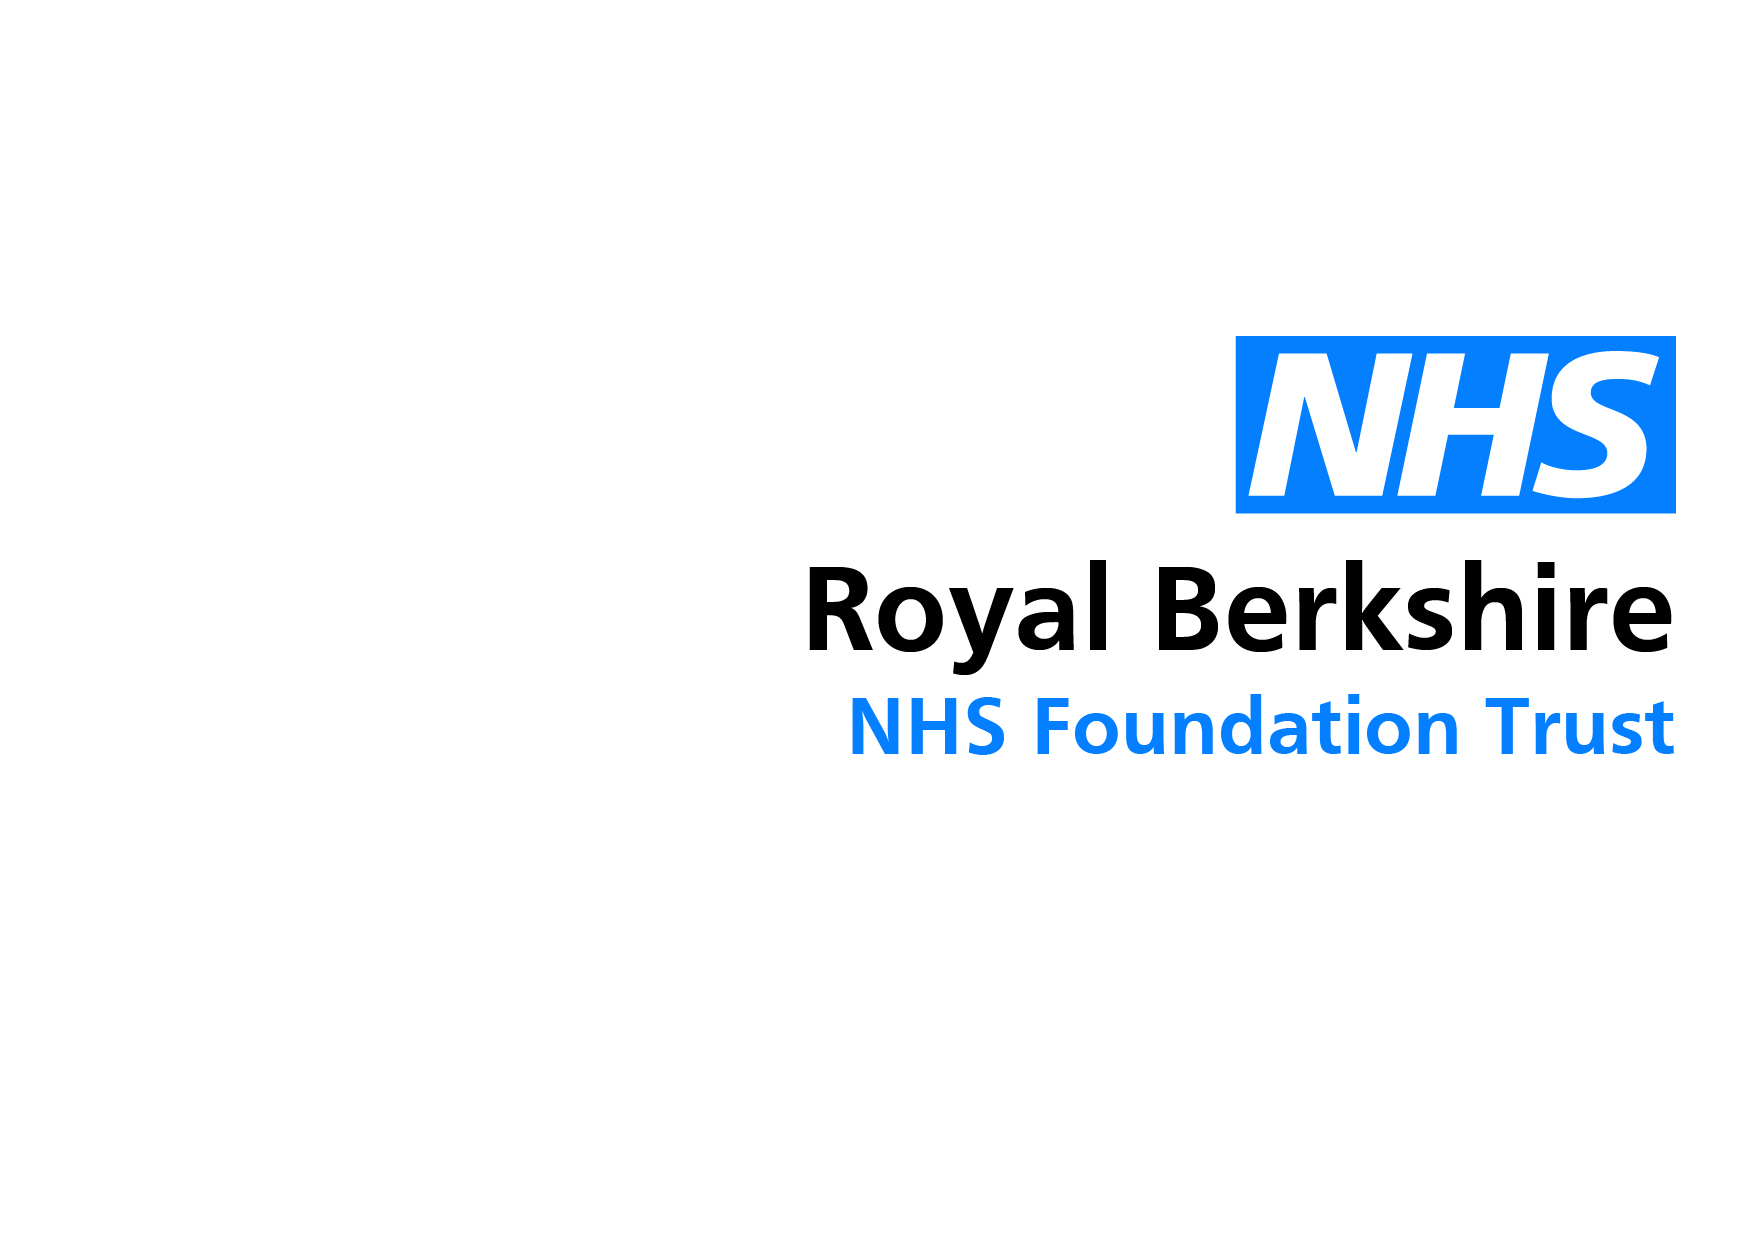 Royal Berkshire NHS Logo